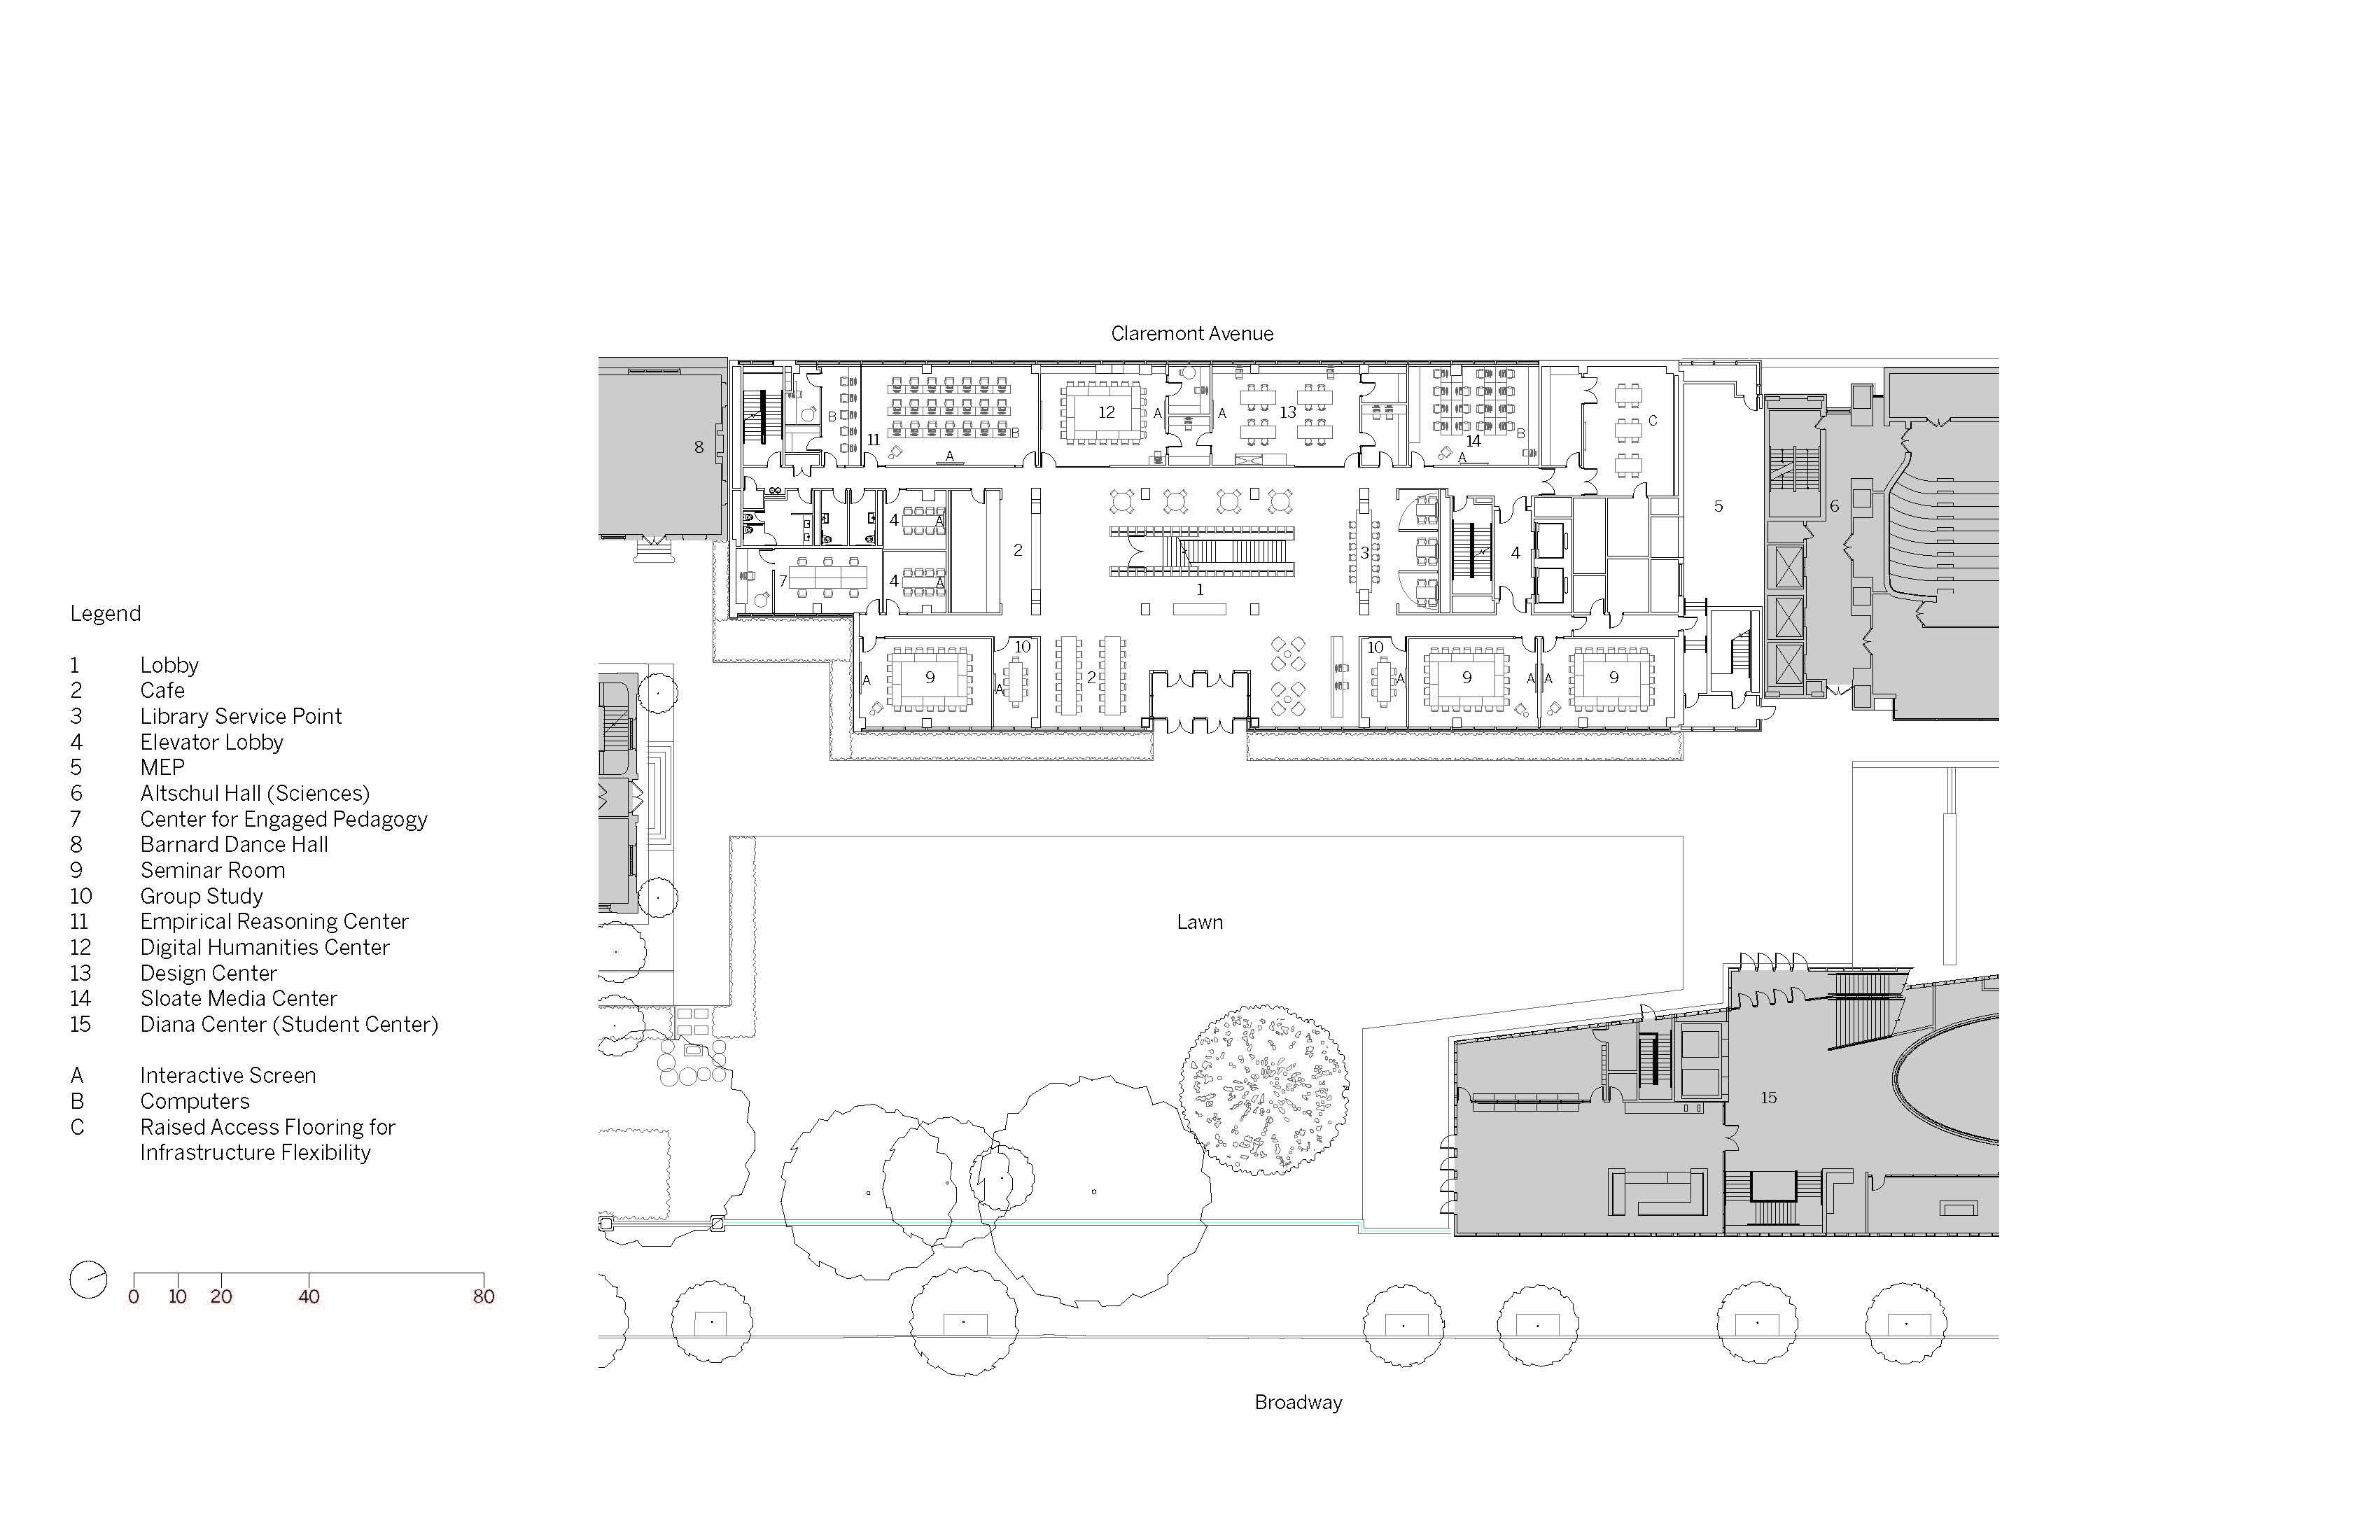 Ground Level Floor Plan Image © SOM}